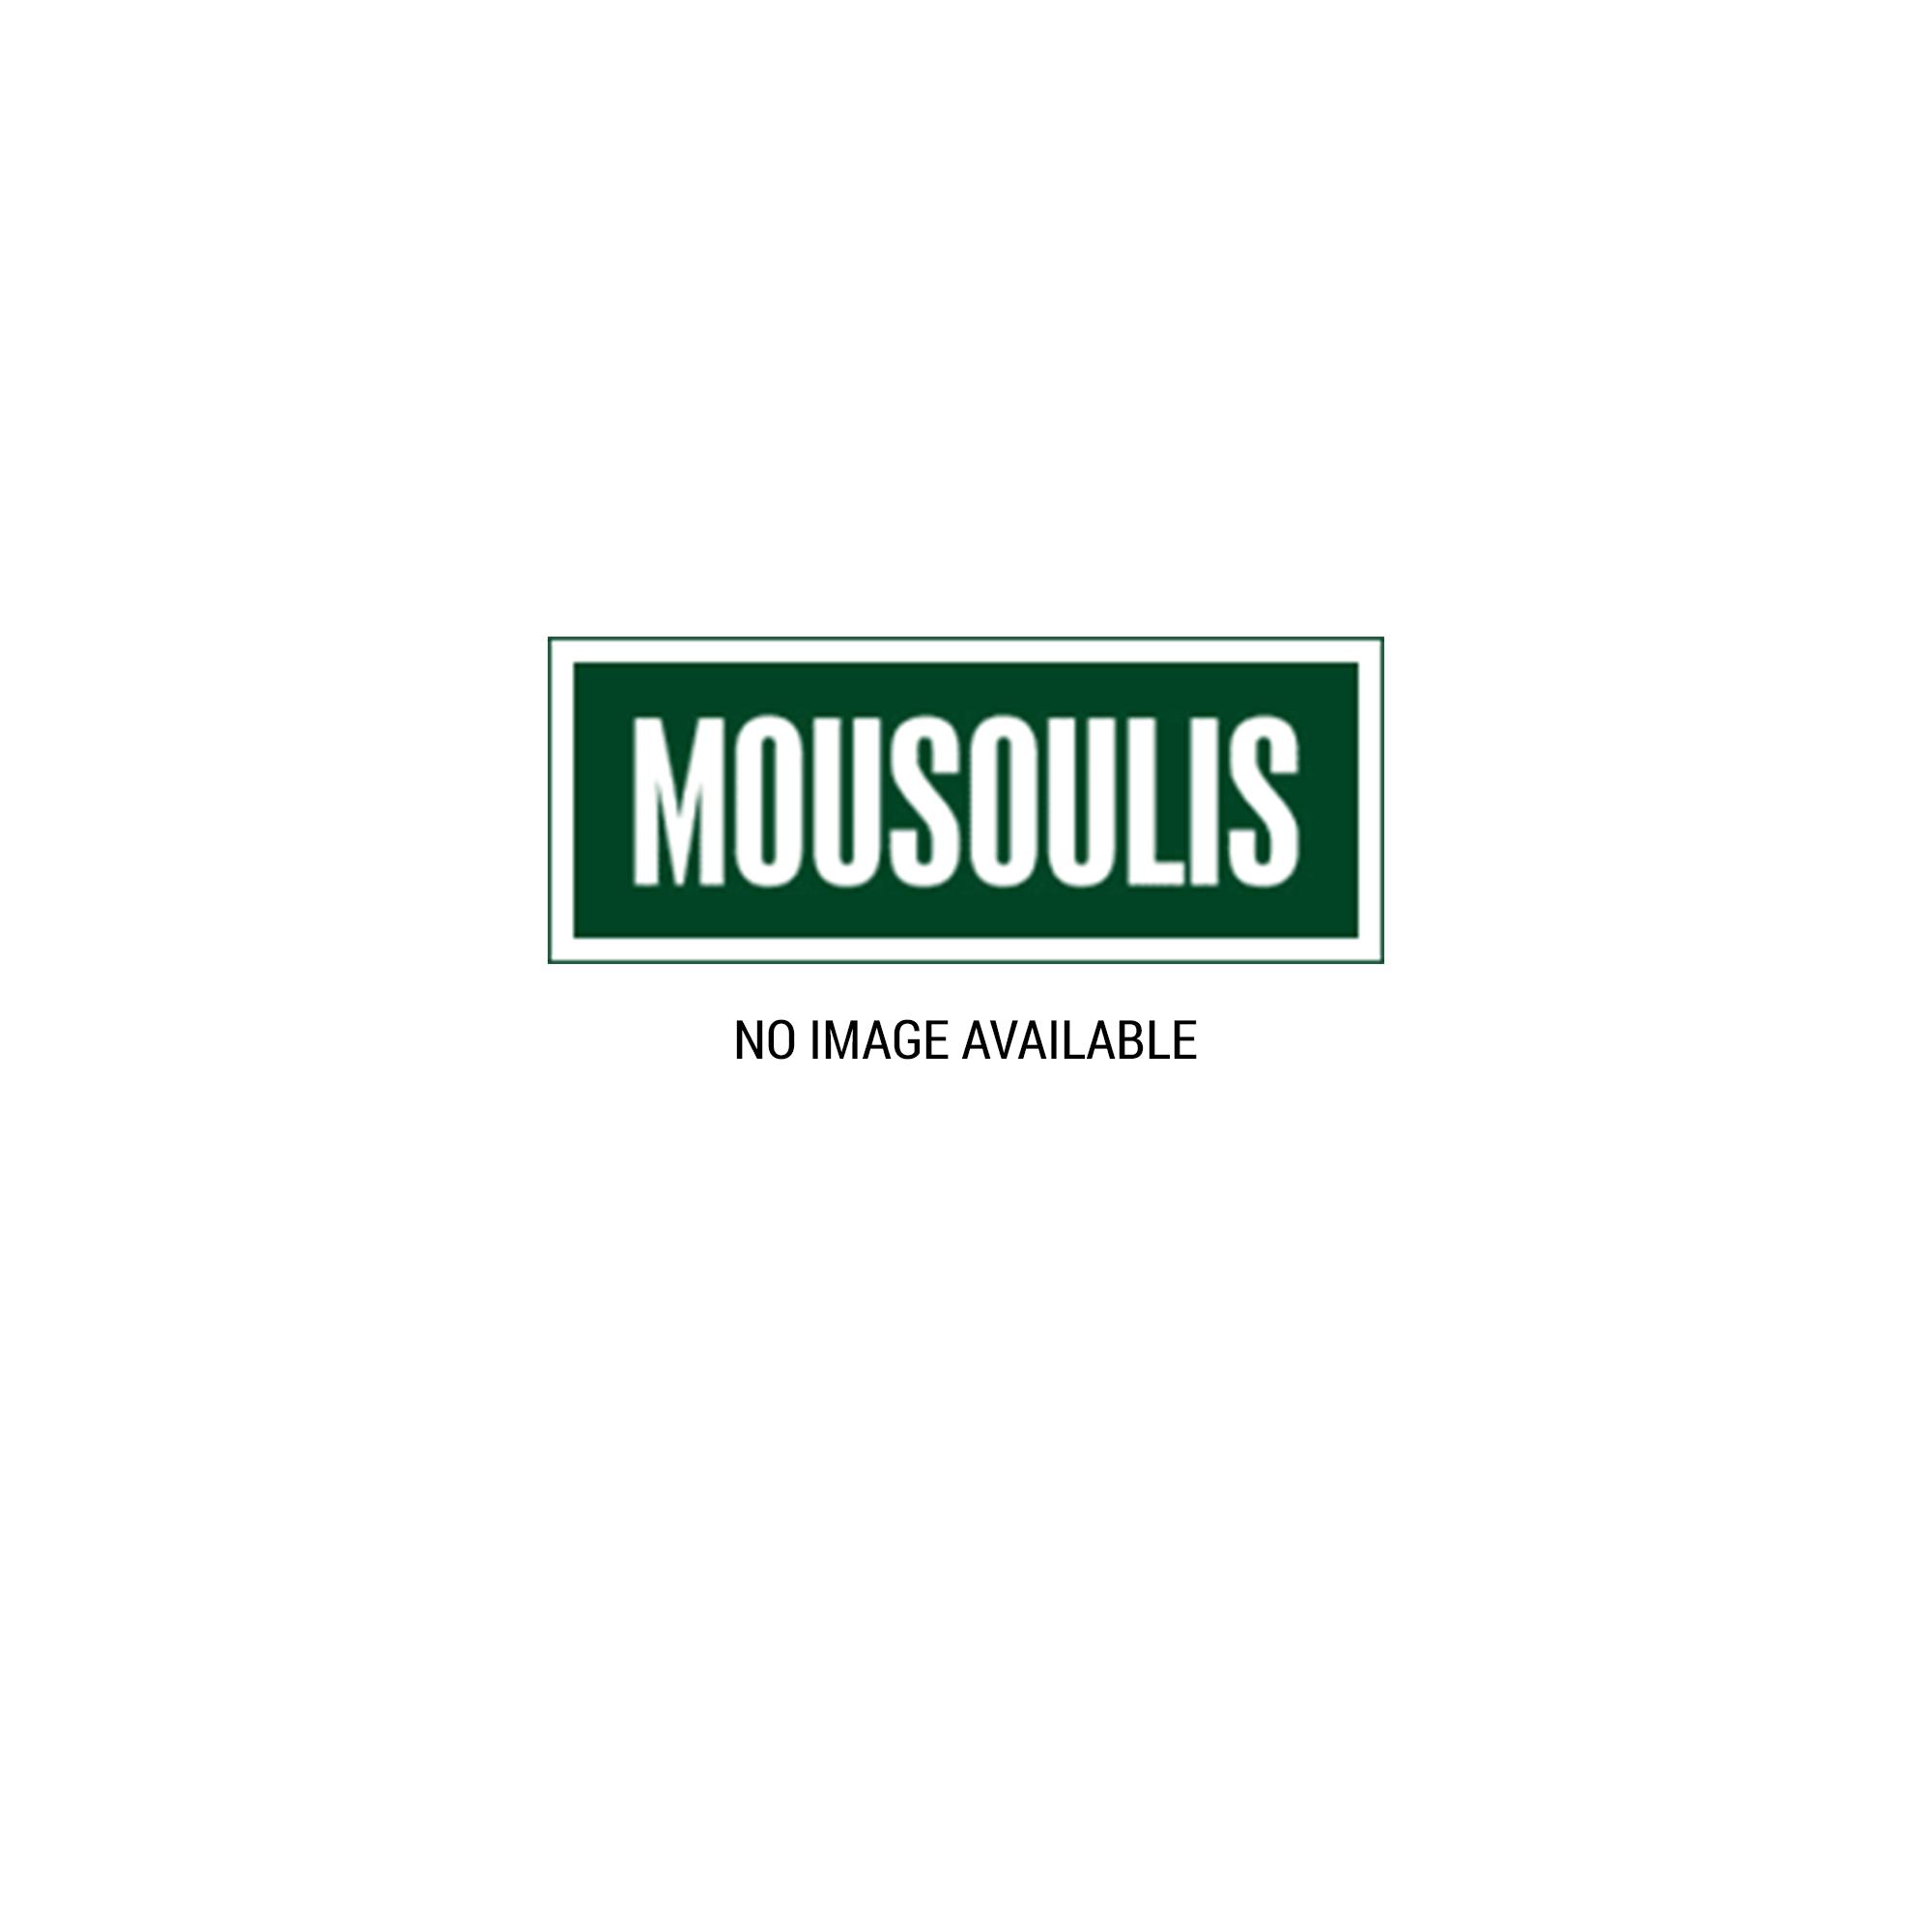 Andrew Scott Κουστούμι Κλασικό Μάλλινο Μονόχρωμο Στενή Γραμμή 552/701 Ανθρακί